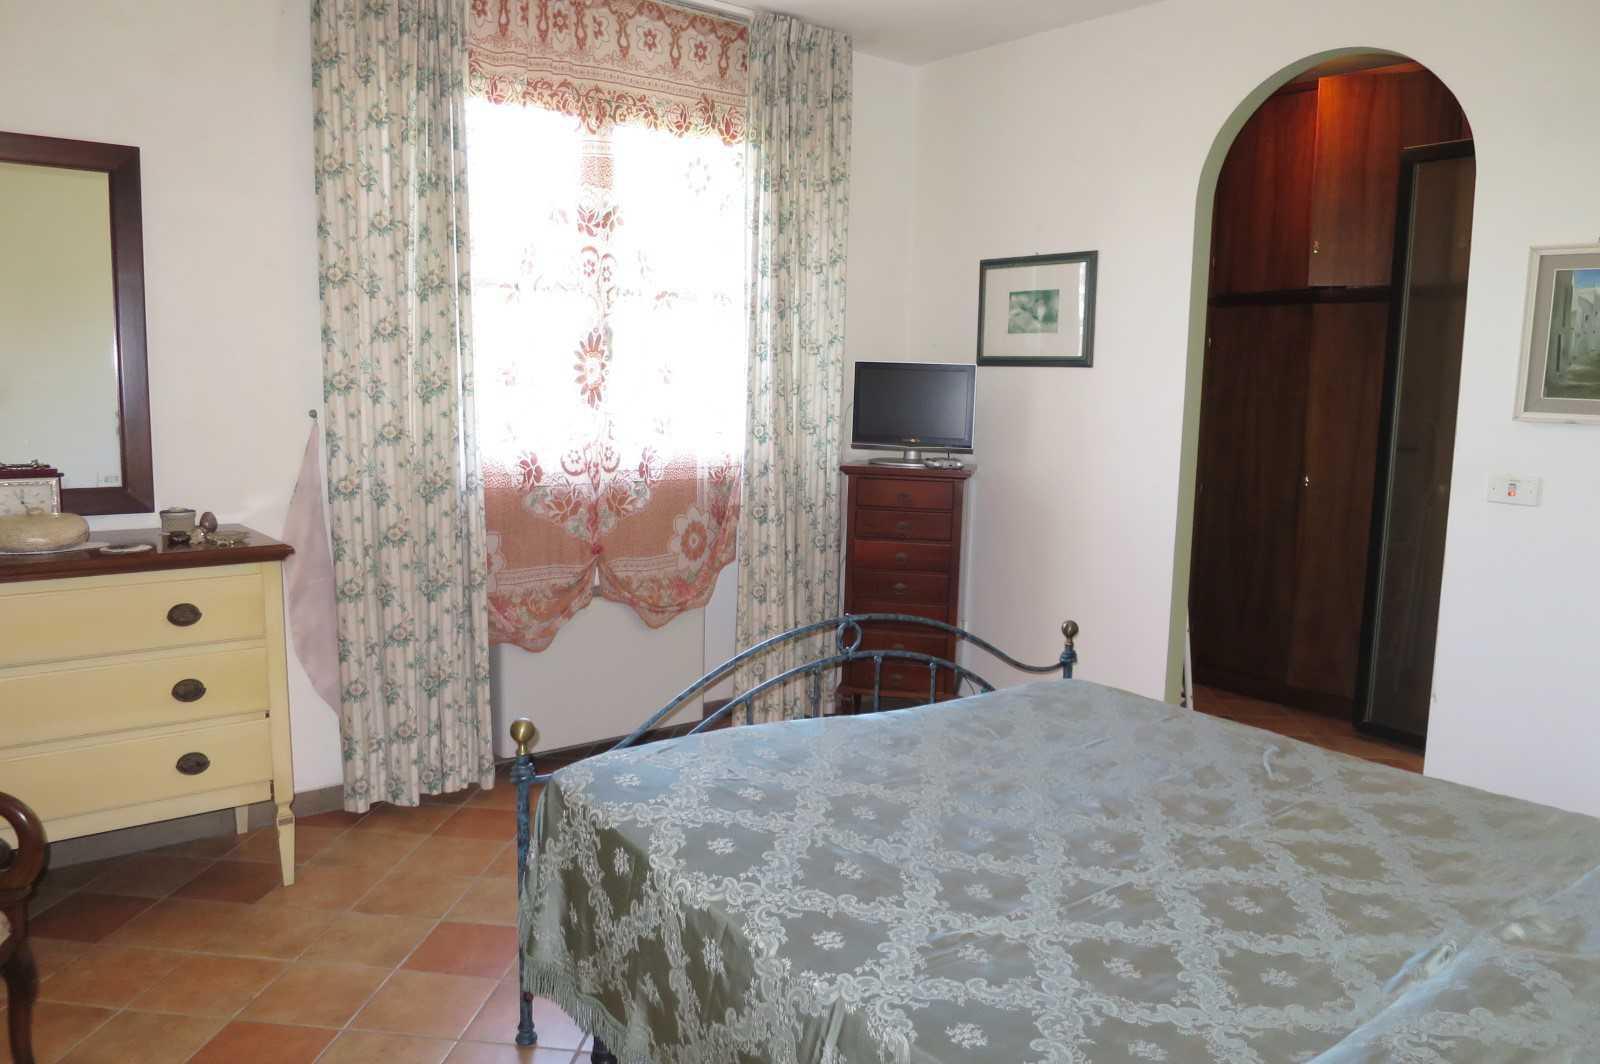 Villa Villa in vendita Atri (TE), Villa Paola - Atri - EUR 471.071 190